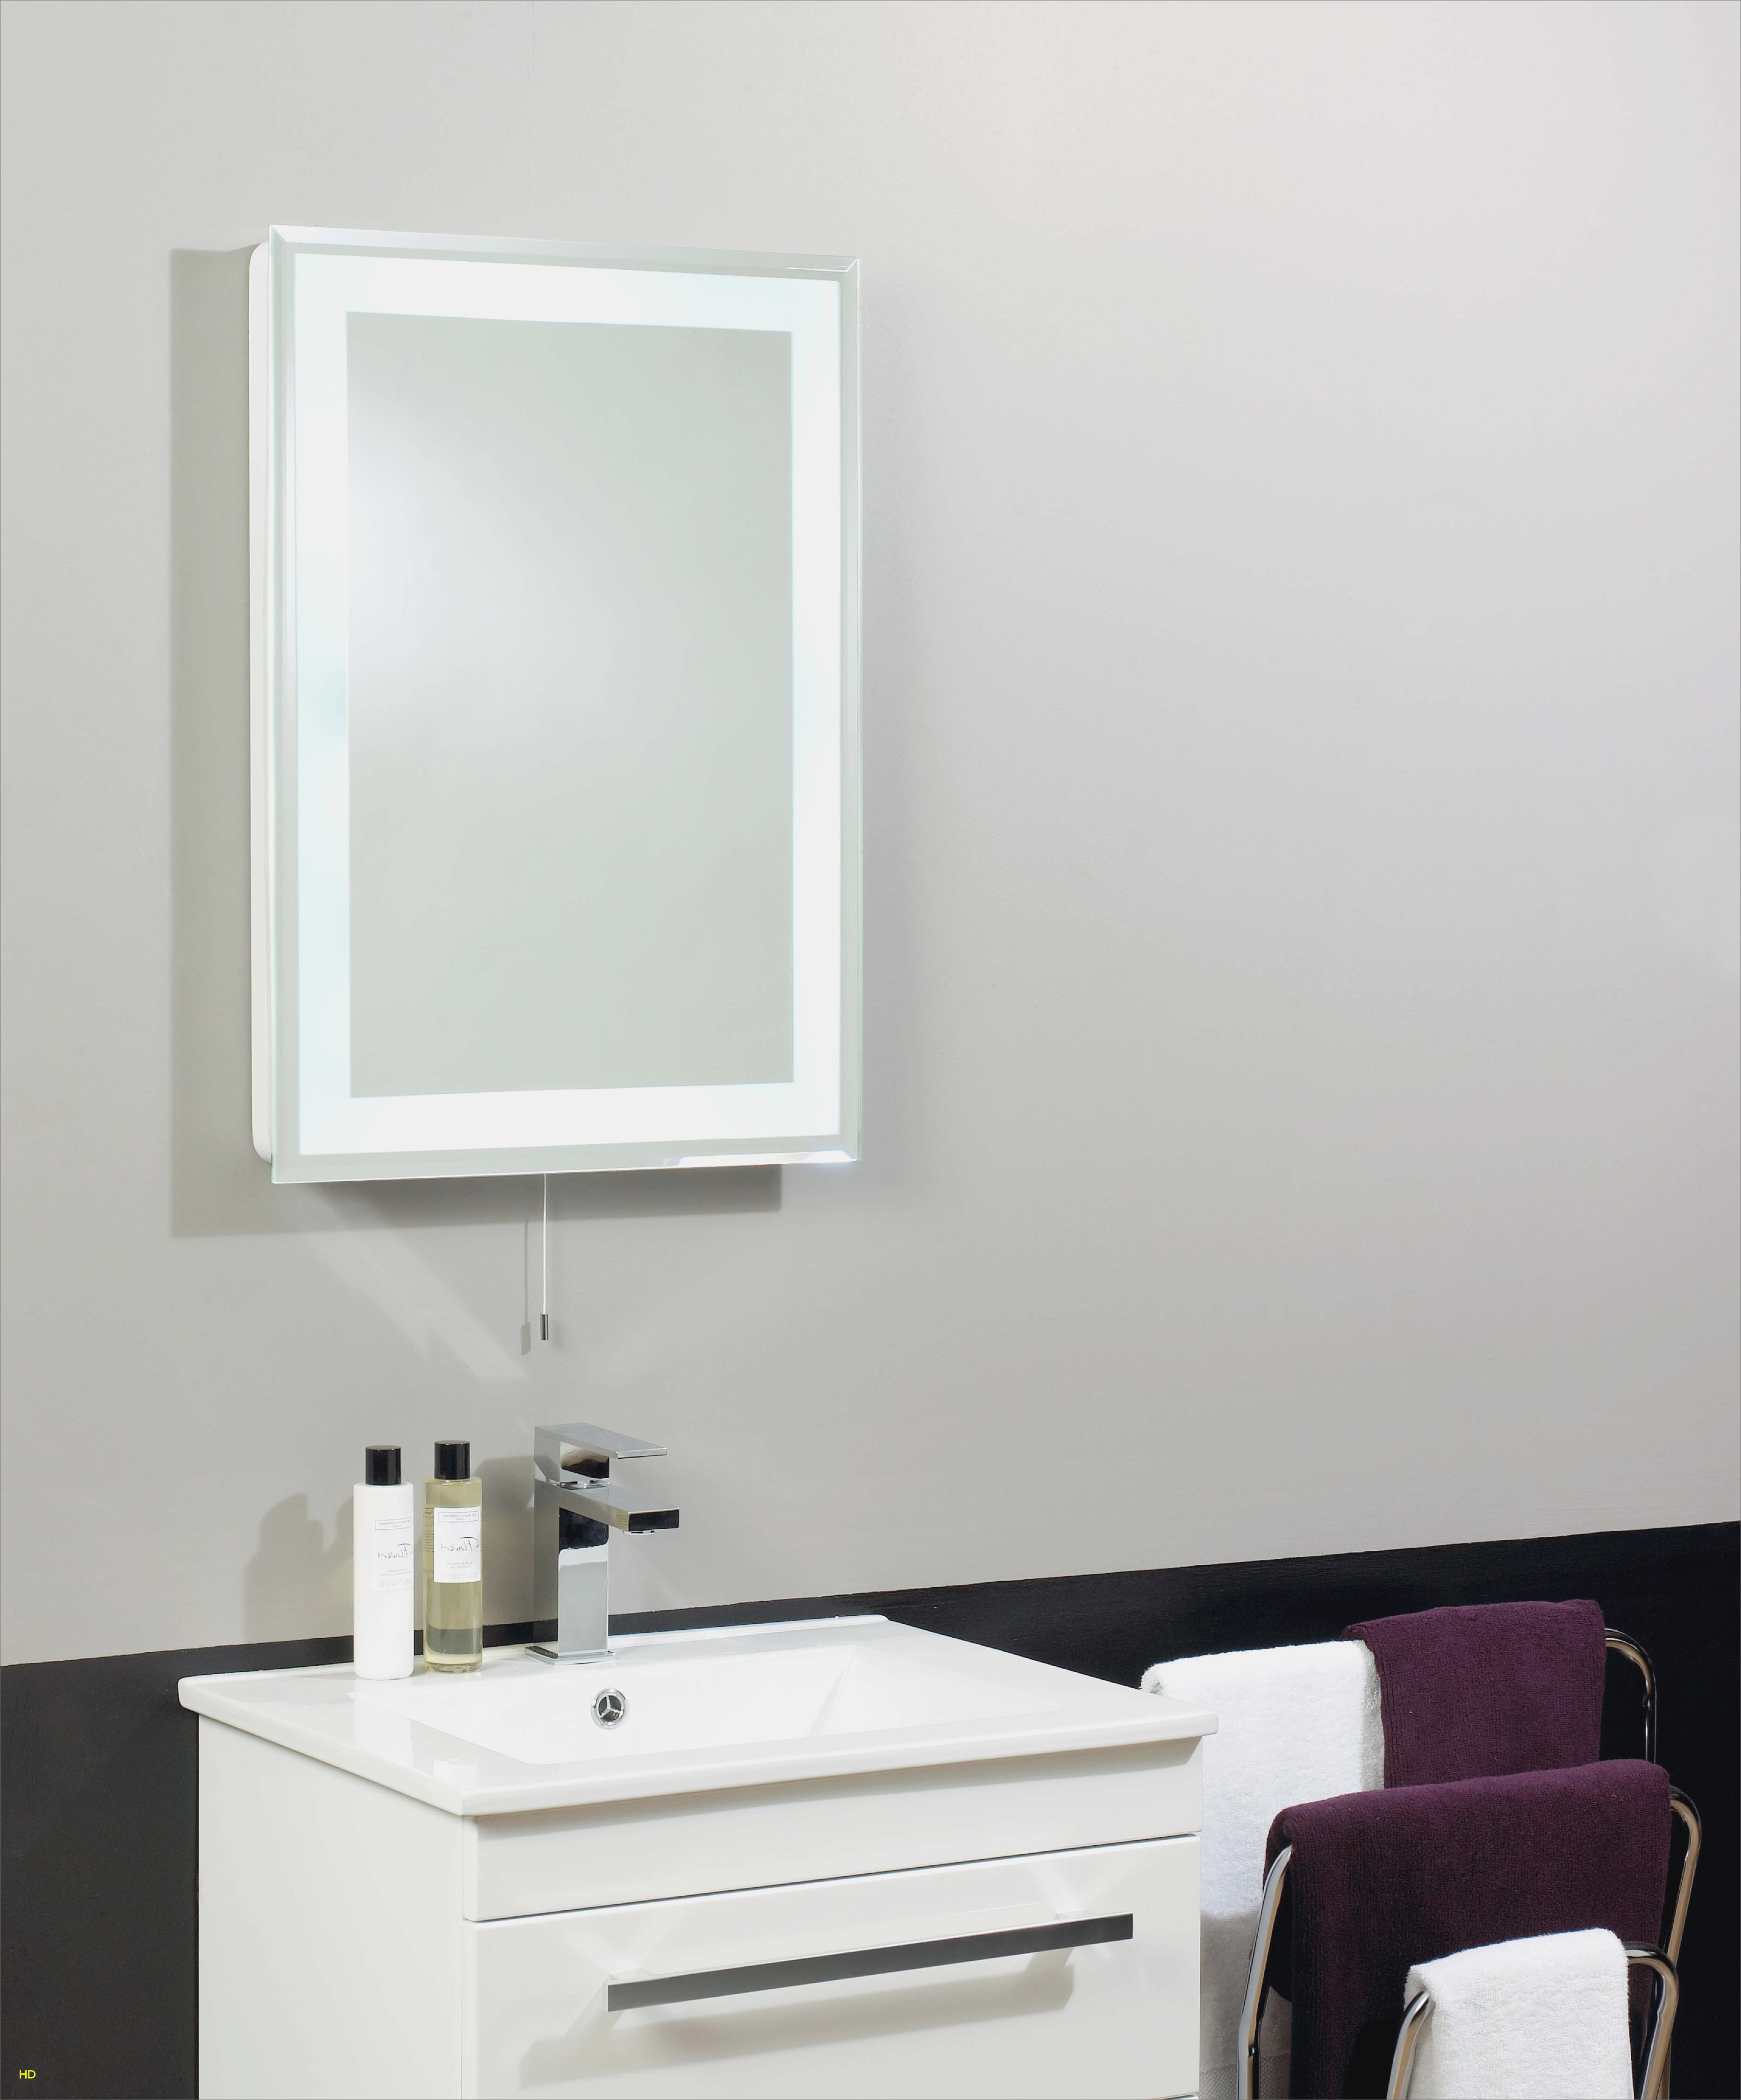 Armoire De toilette Miroir Castorama Beau Galerie Armoires De toilette Castorama Ainsi Que Contemporain Miroir Salle